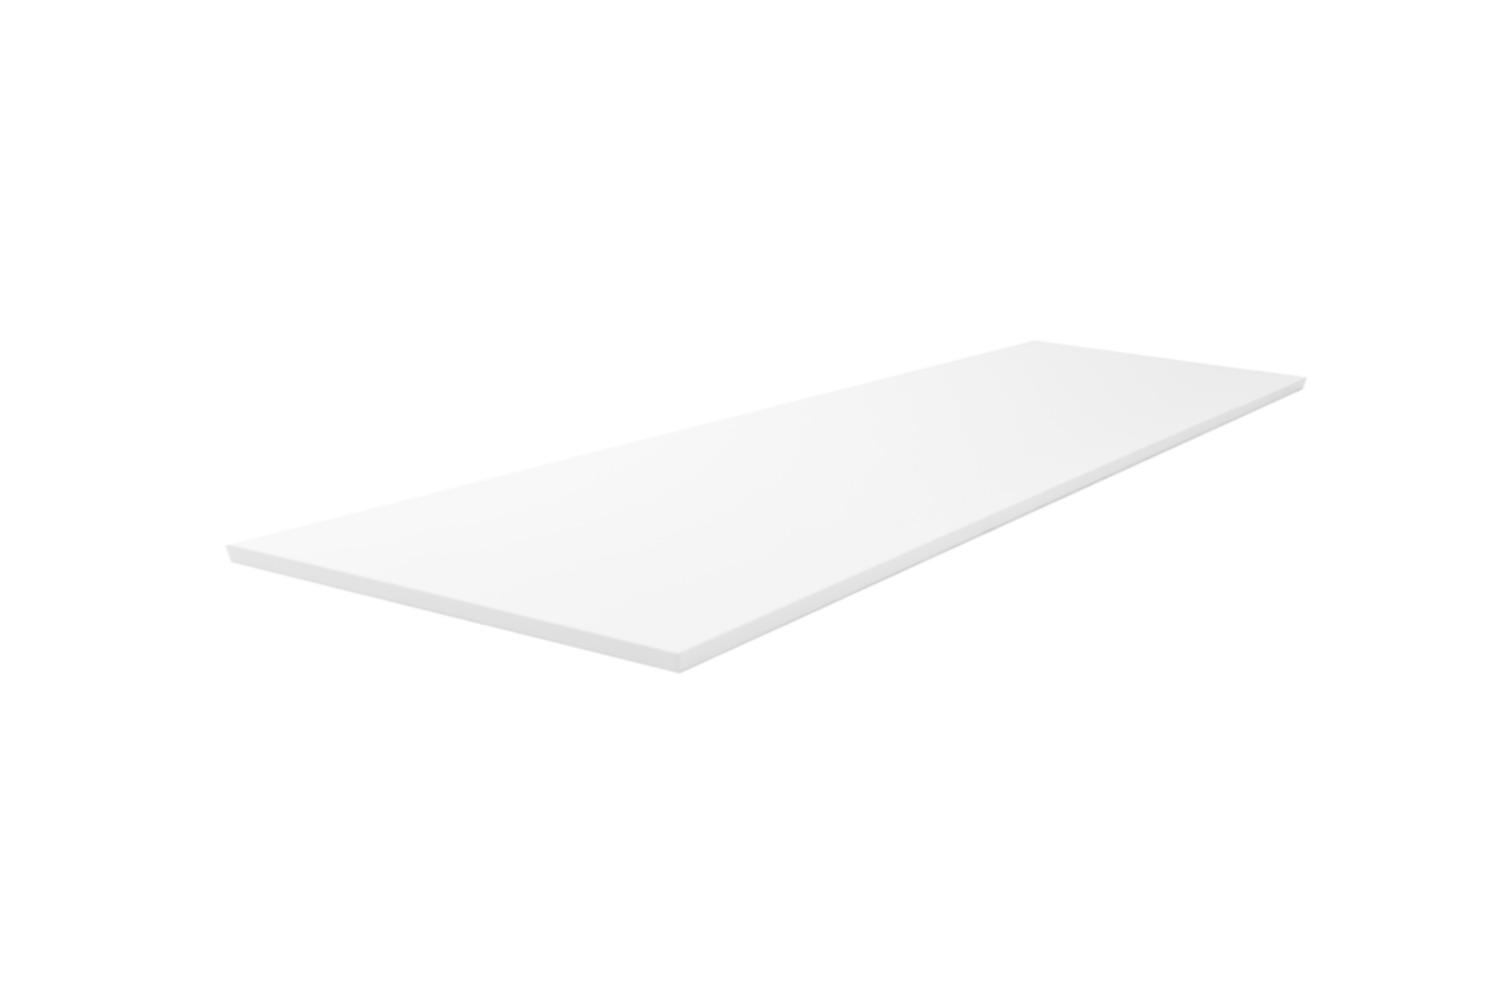 Wiesbaden Vision topblad 121x47,5x2,5 cm, wit